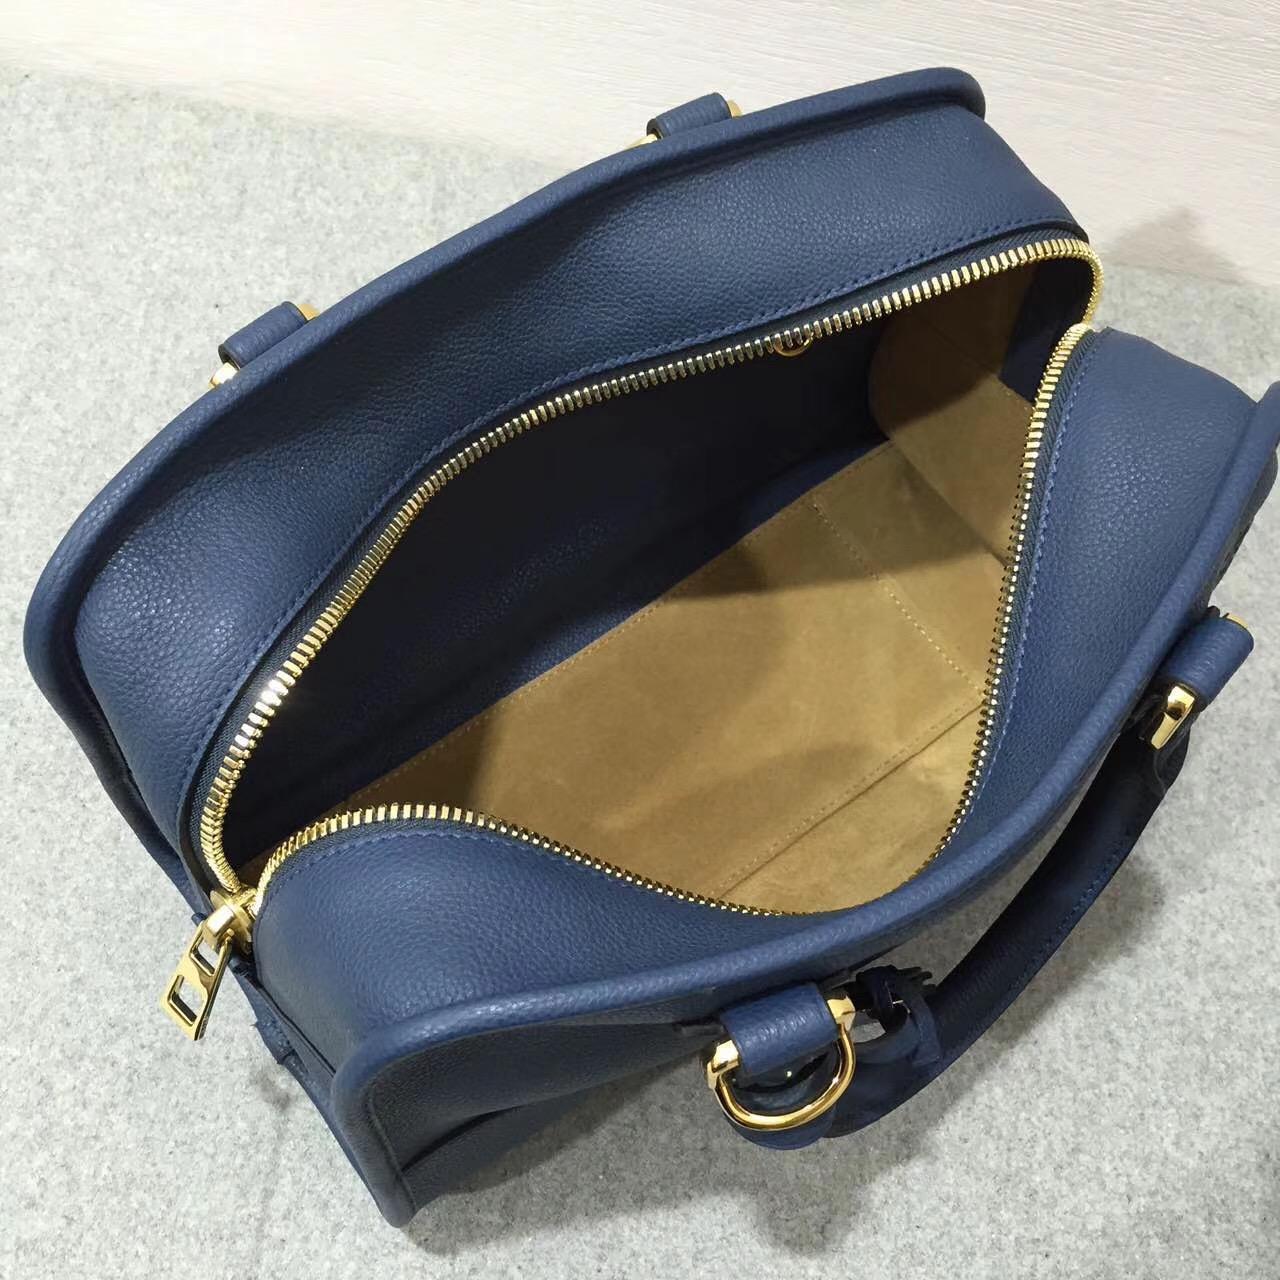 Loewe羅意威 Amazona 28 Bag 粒面小牛皮 靛蓝色